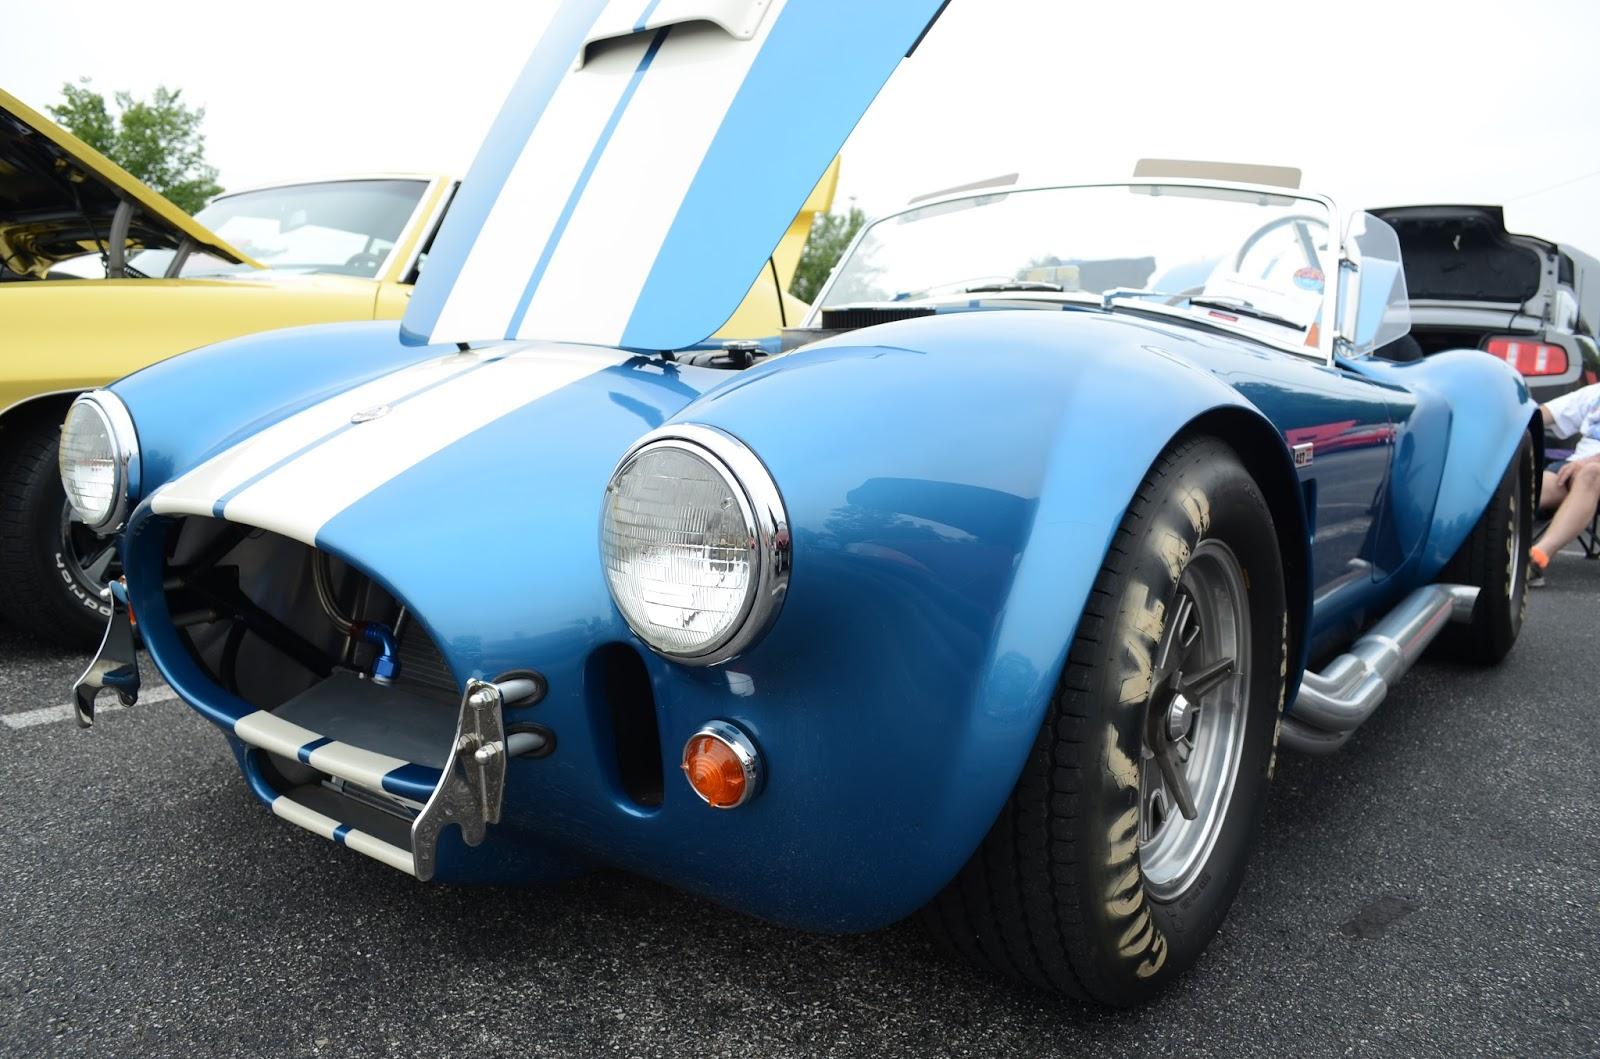 Turnerbudds Car Blog: 1st Clermont Classics Car Show and Flea Market